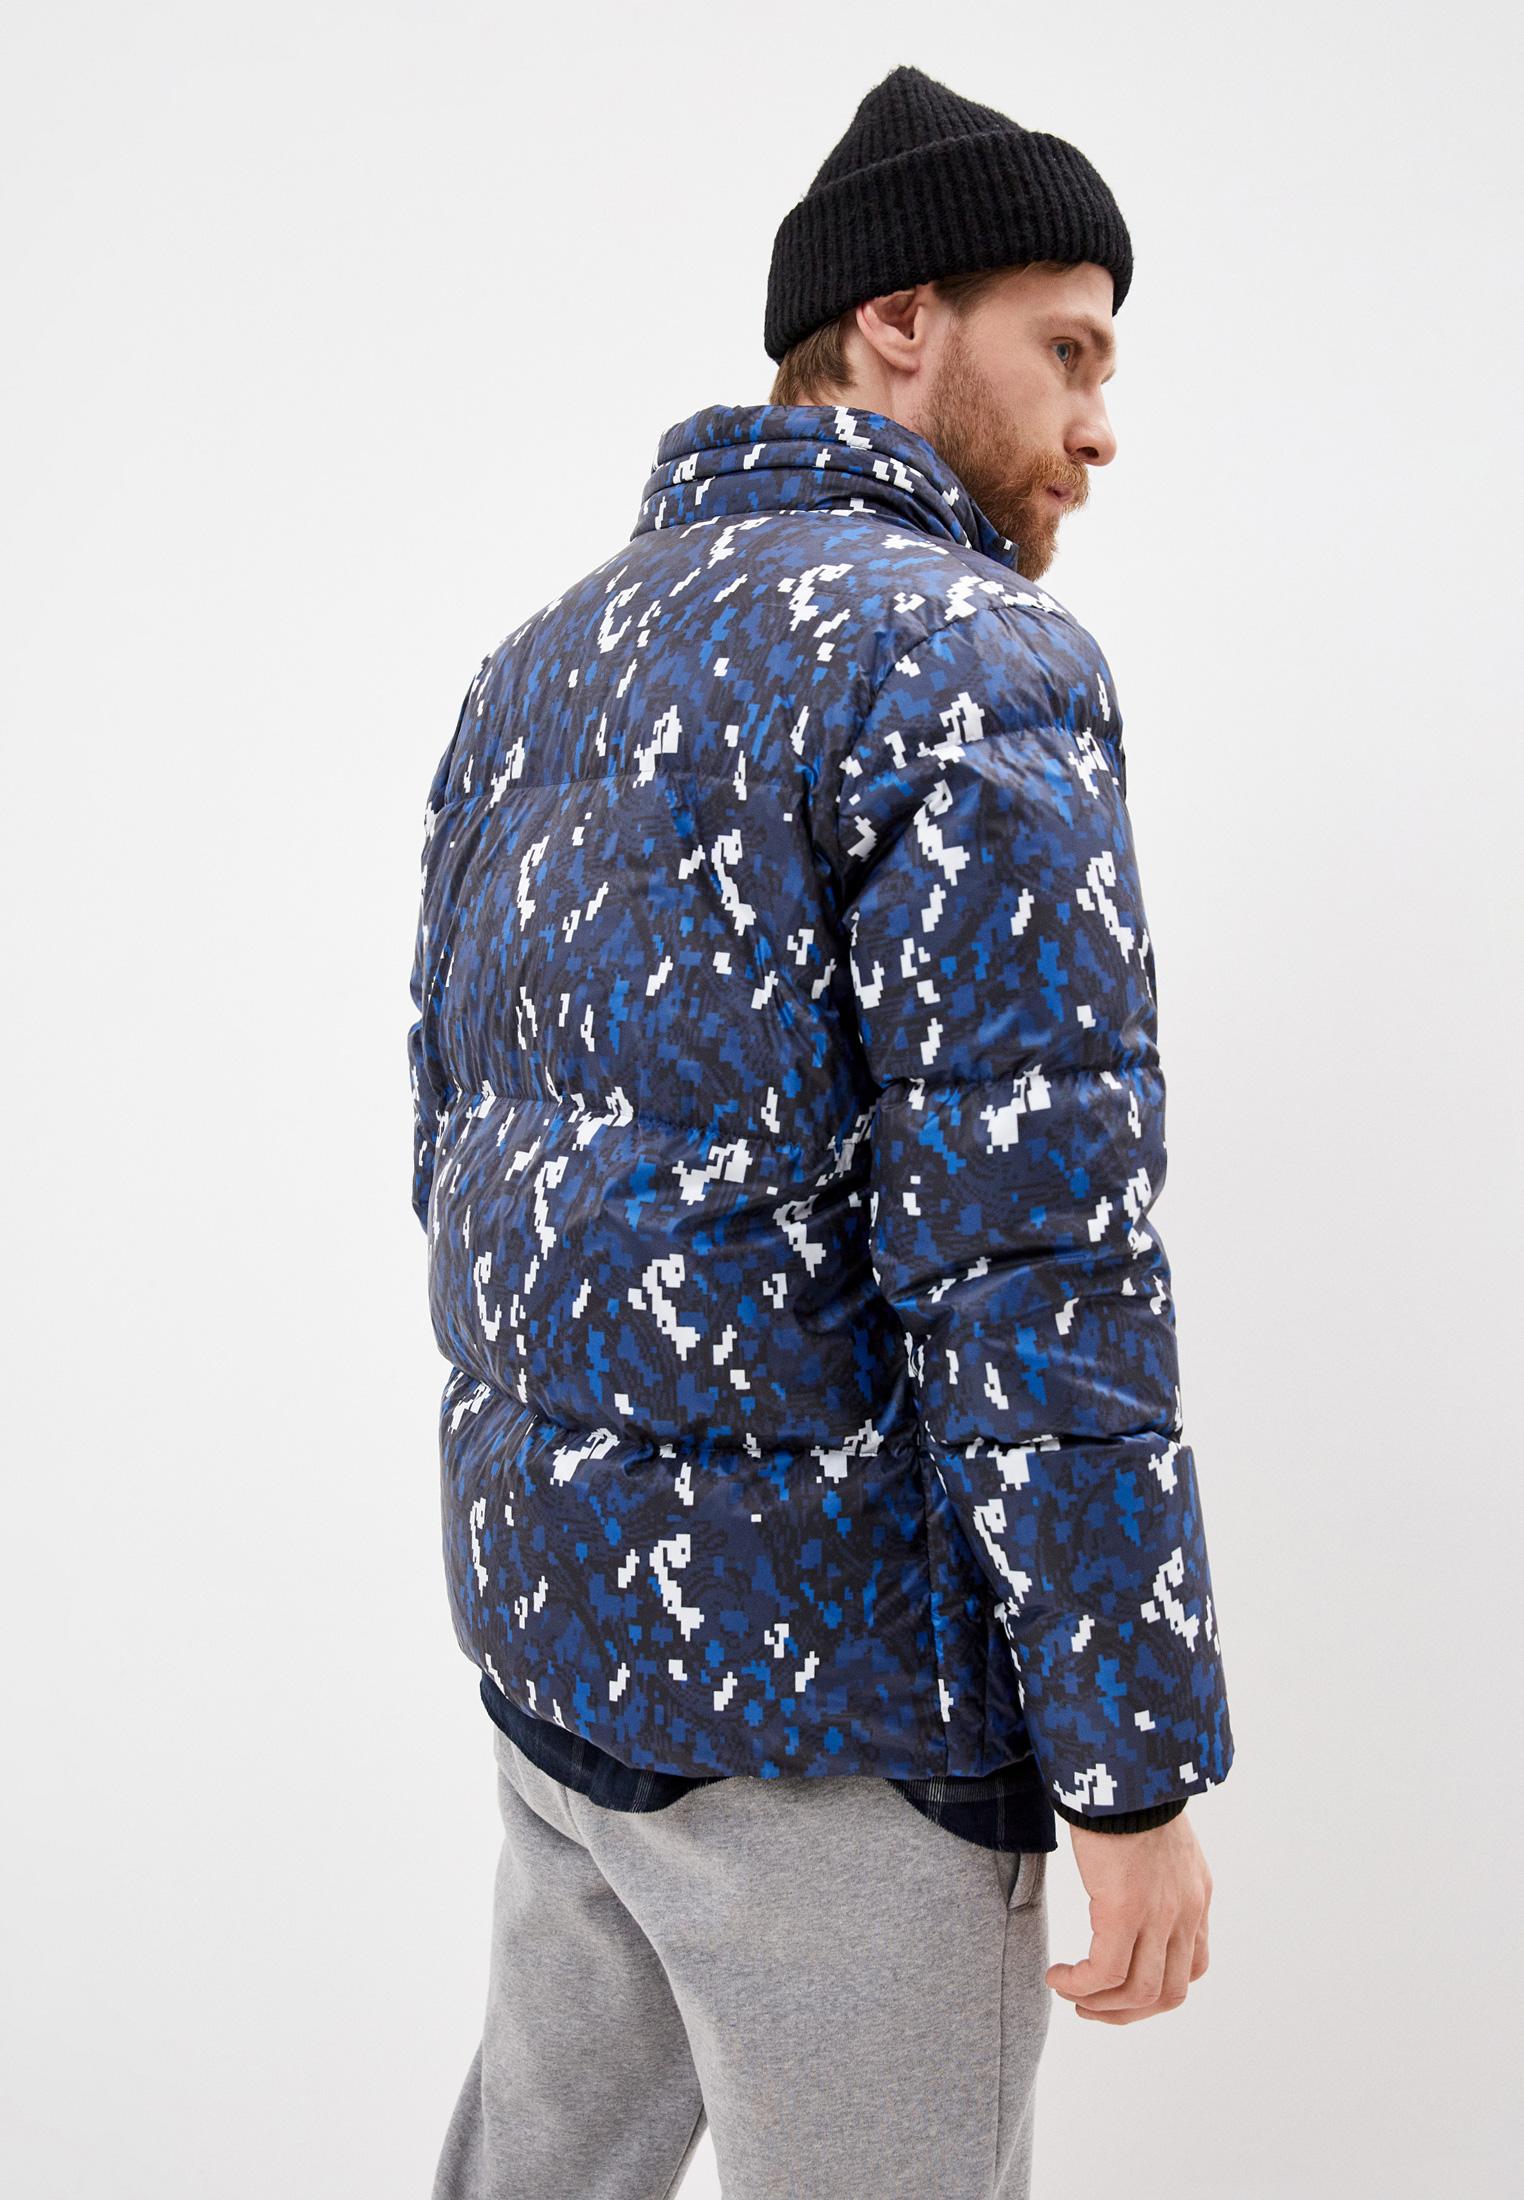 Мужская куртка Bikkembergs (Биккембергс) C H 052 00 T 9595: изображение 4